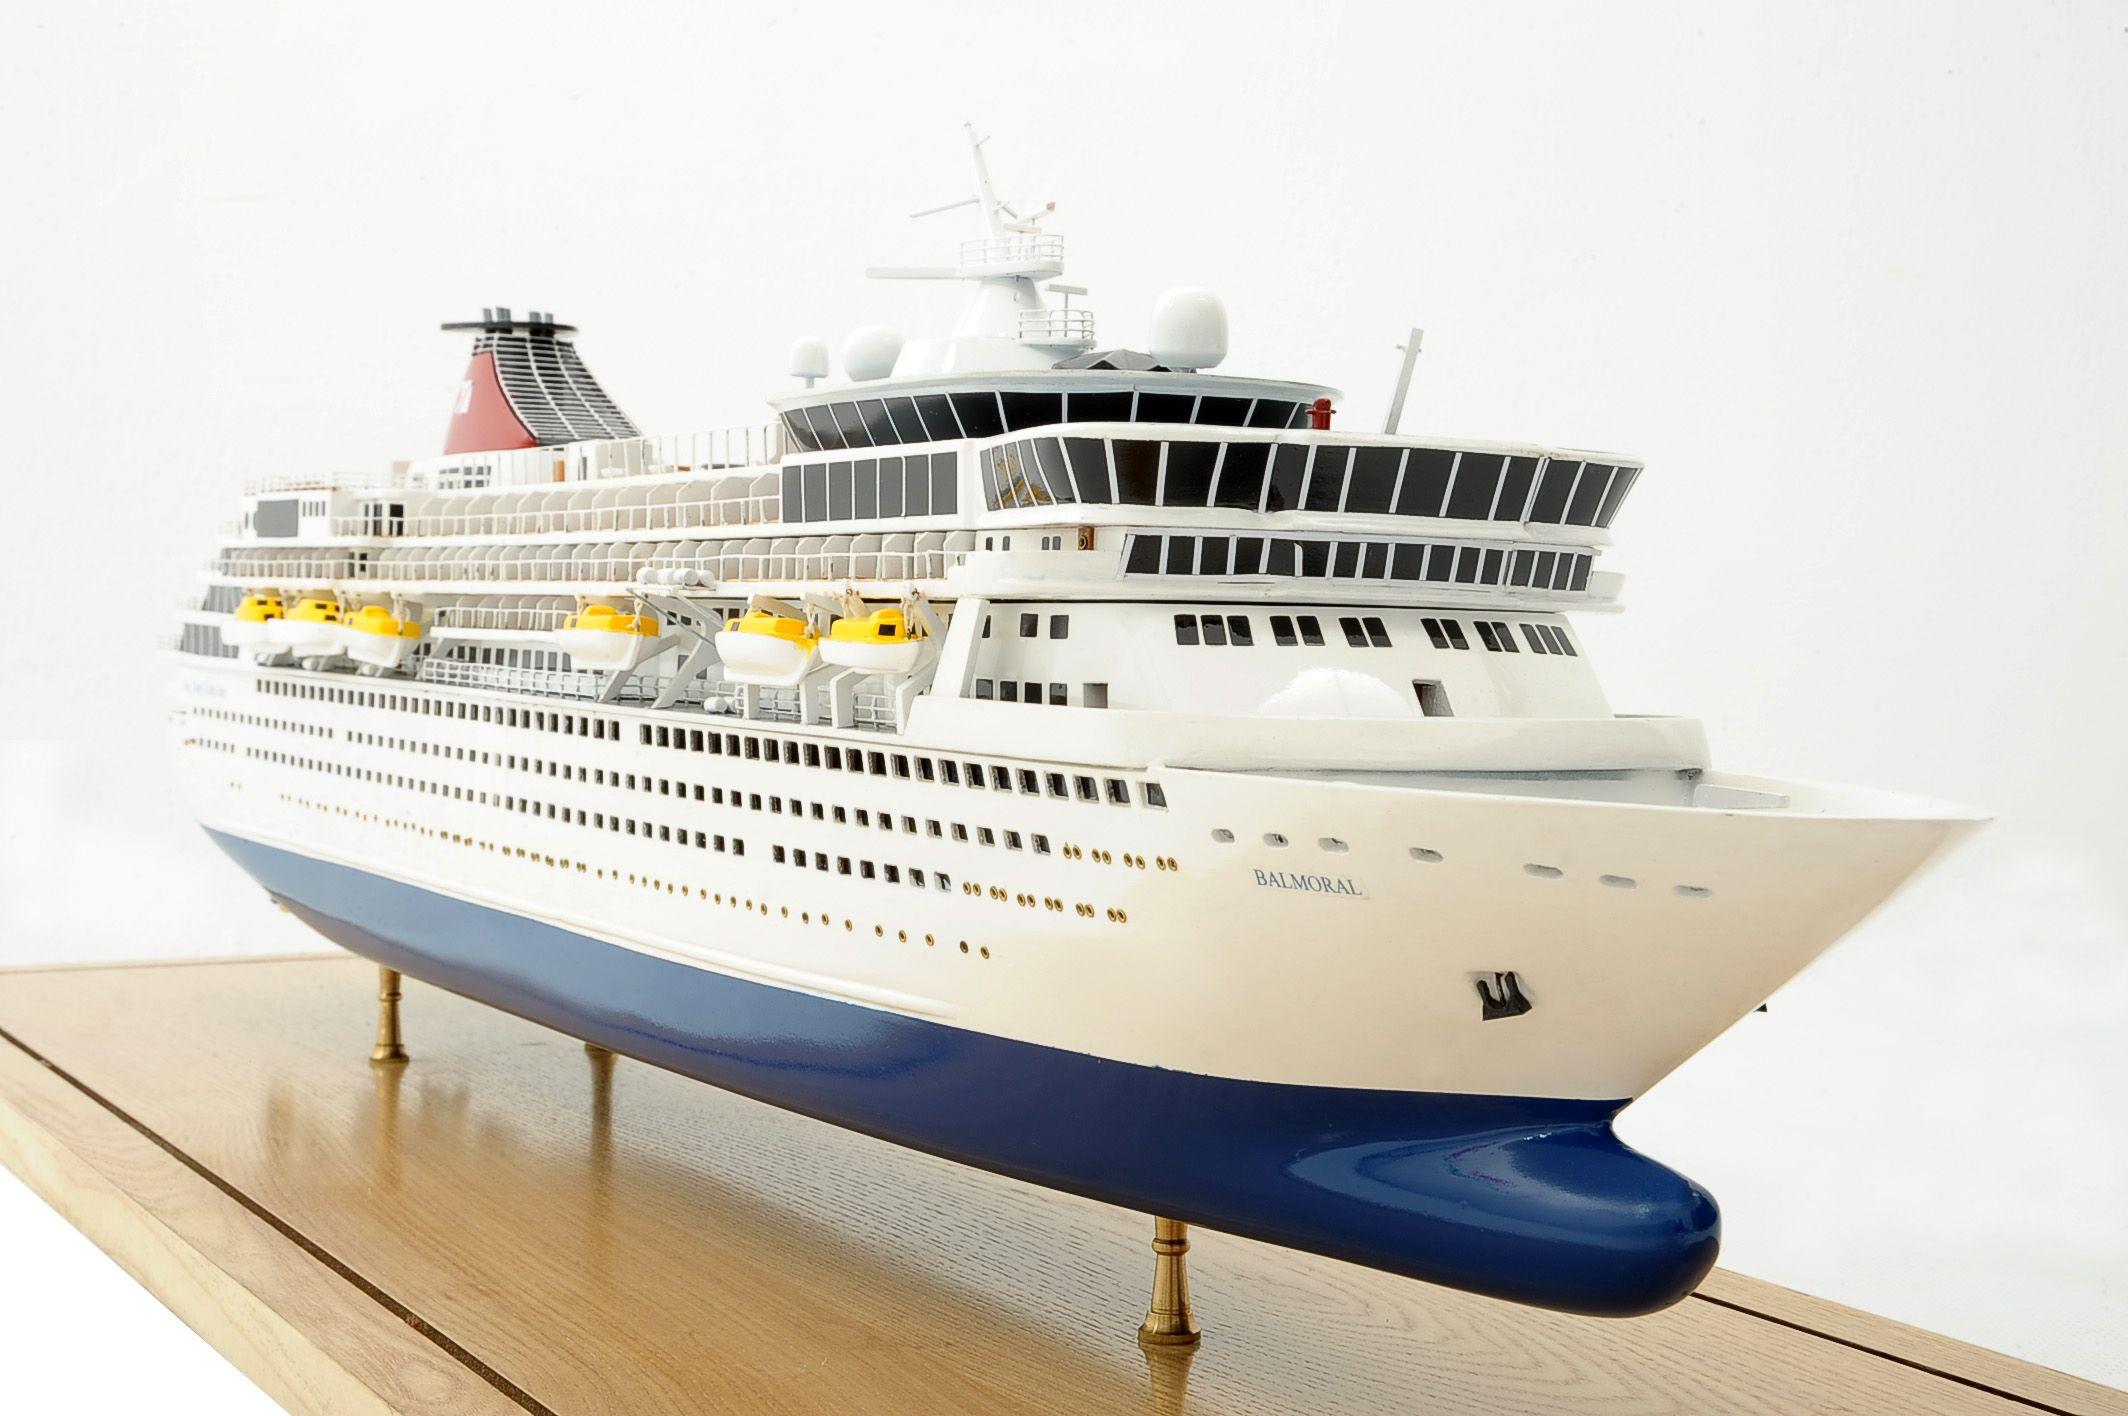 1292-6428-Balmoral-Cruise-Liner